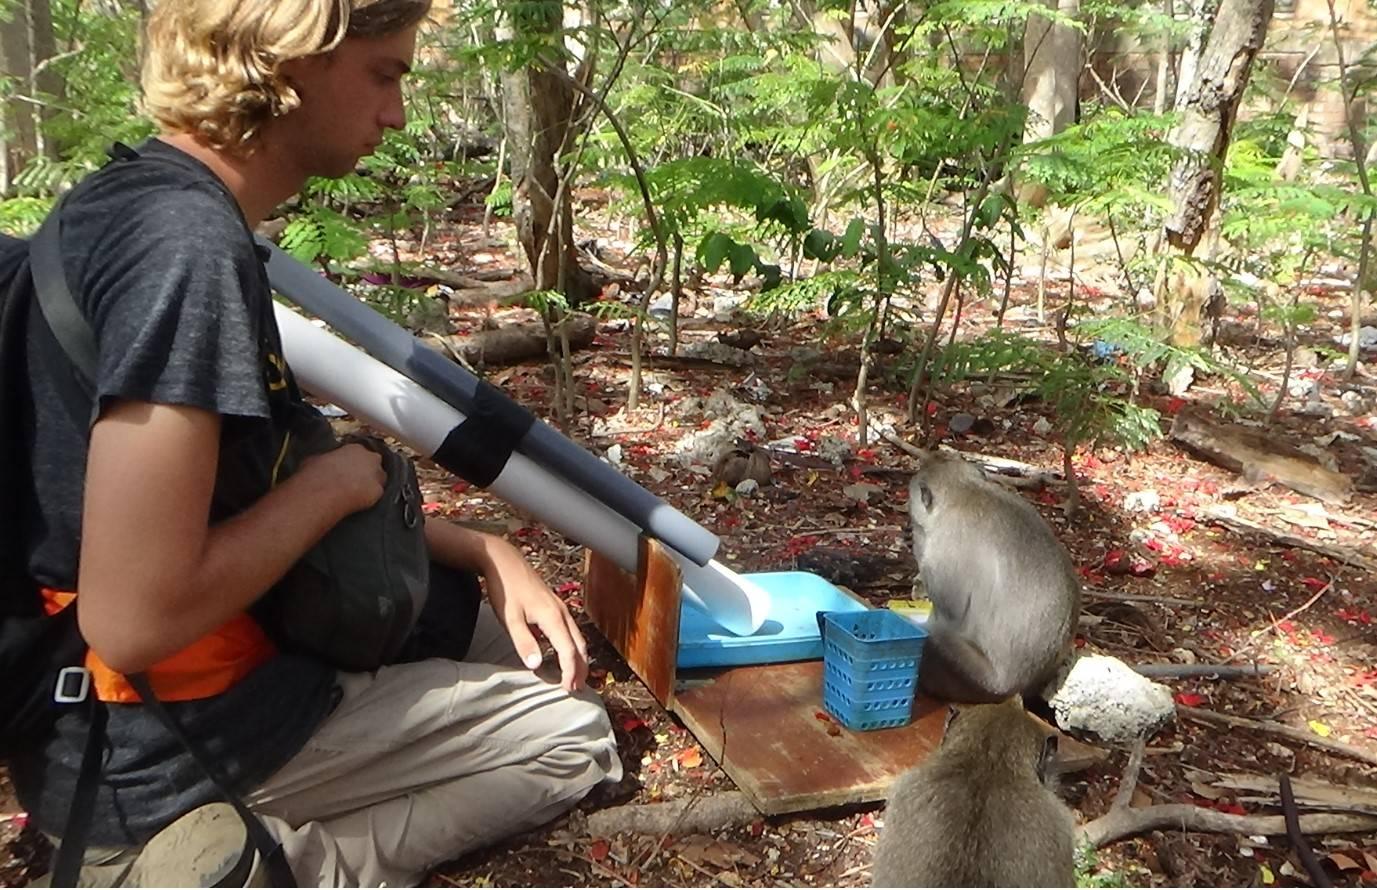 Caleb Bunselmeyer experimentally inducing bartering in a long-tailed macaque (Uluwatu, Bali, Nov. 2019)